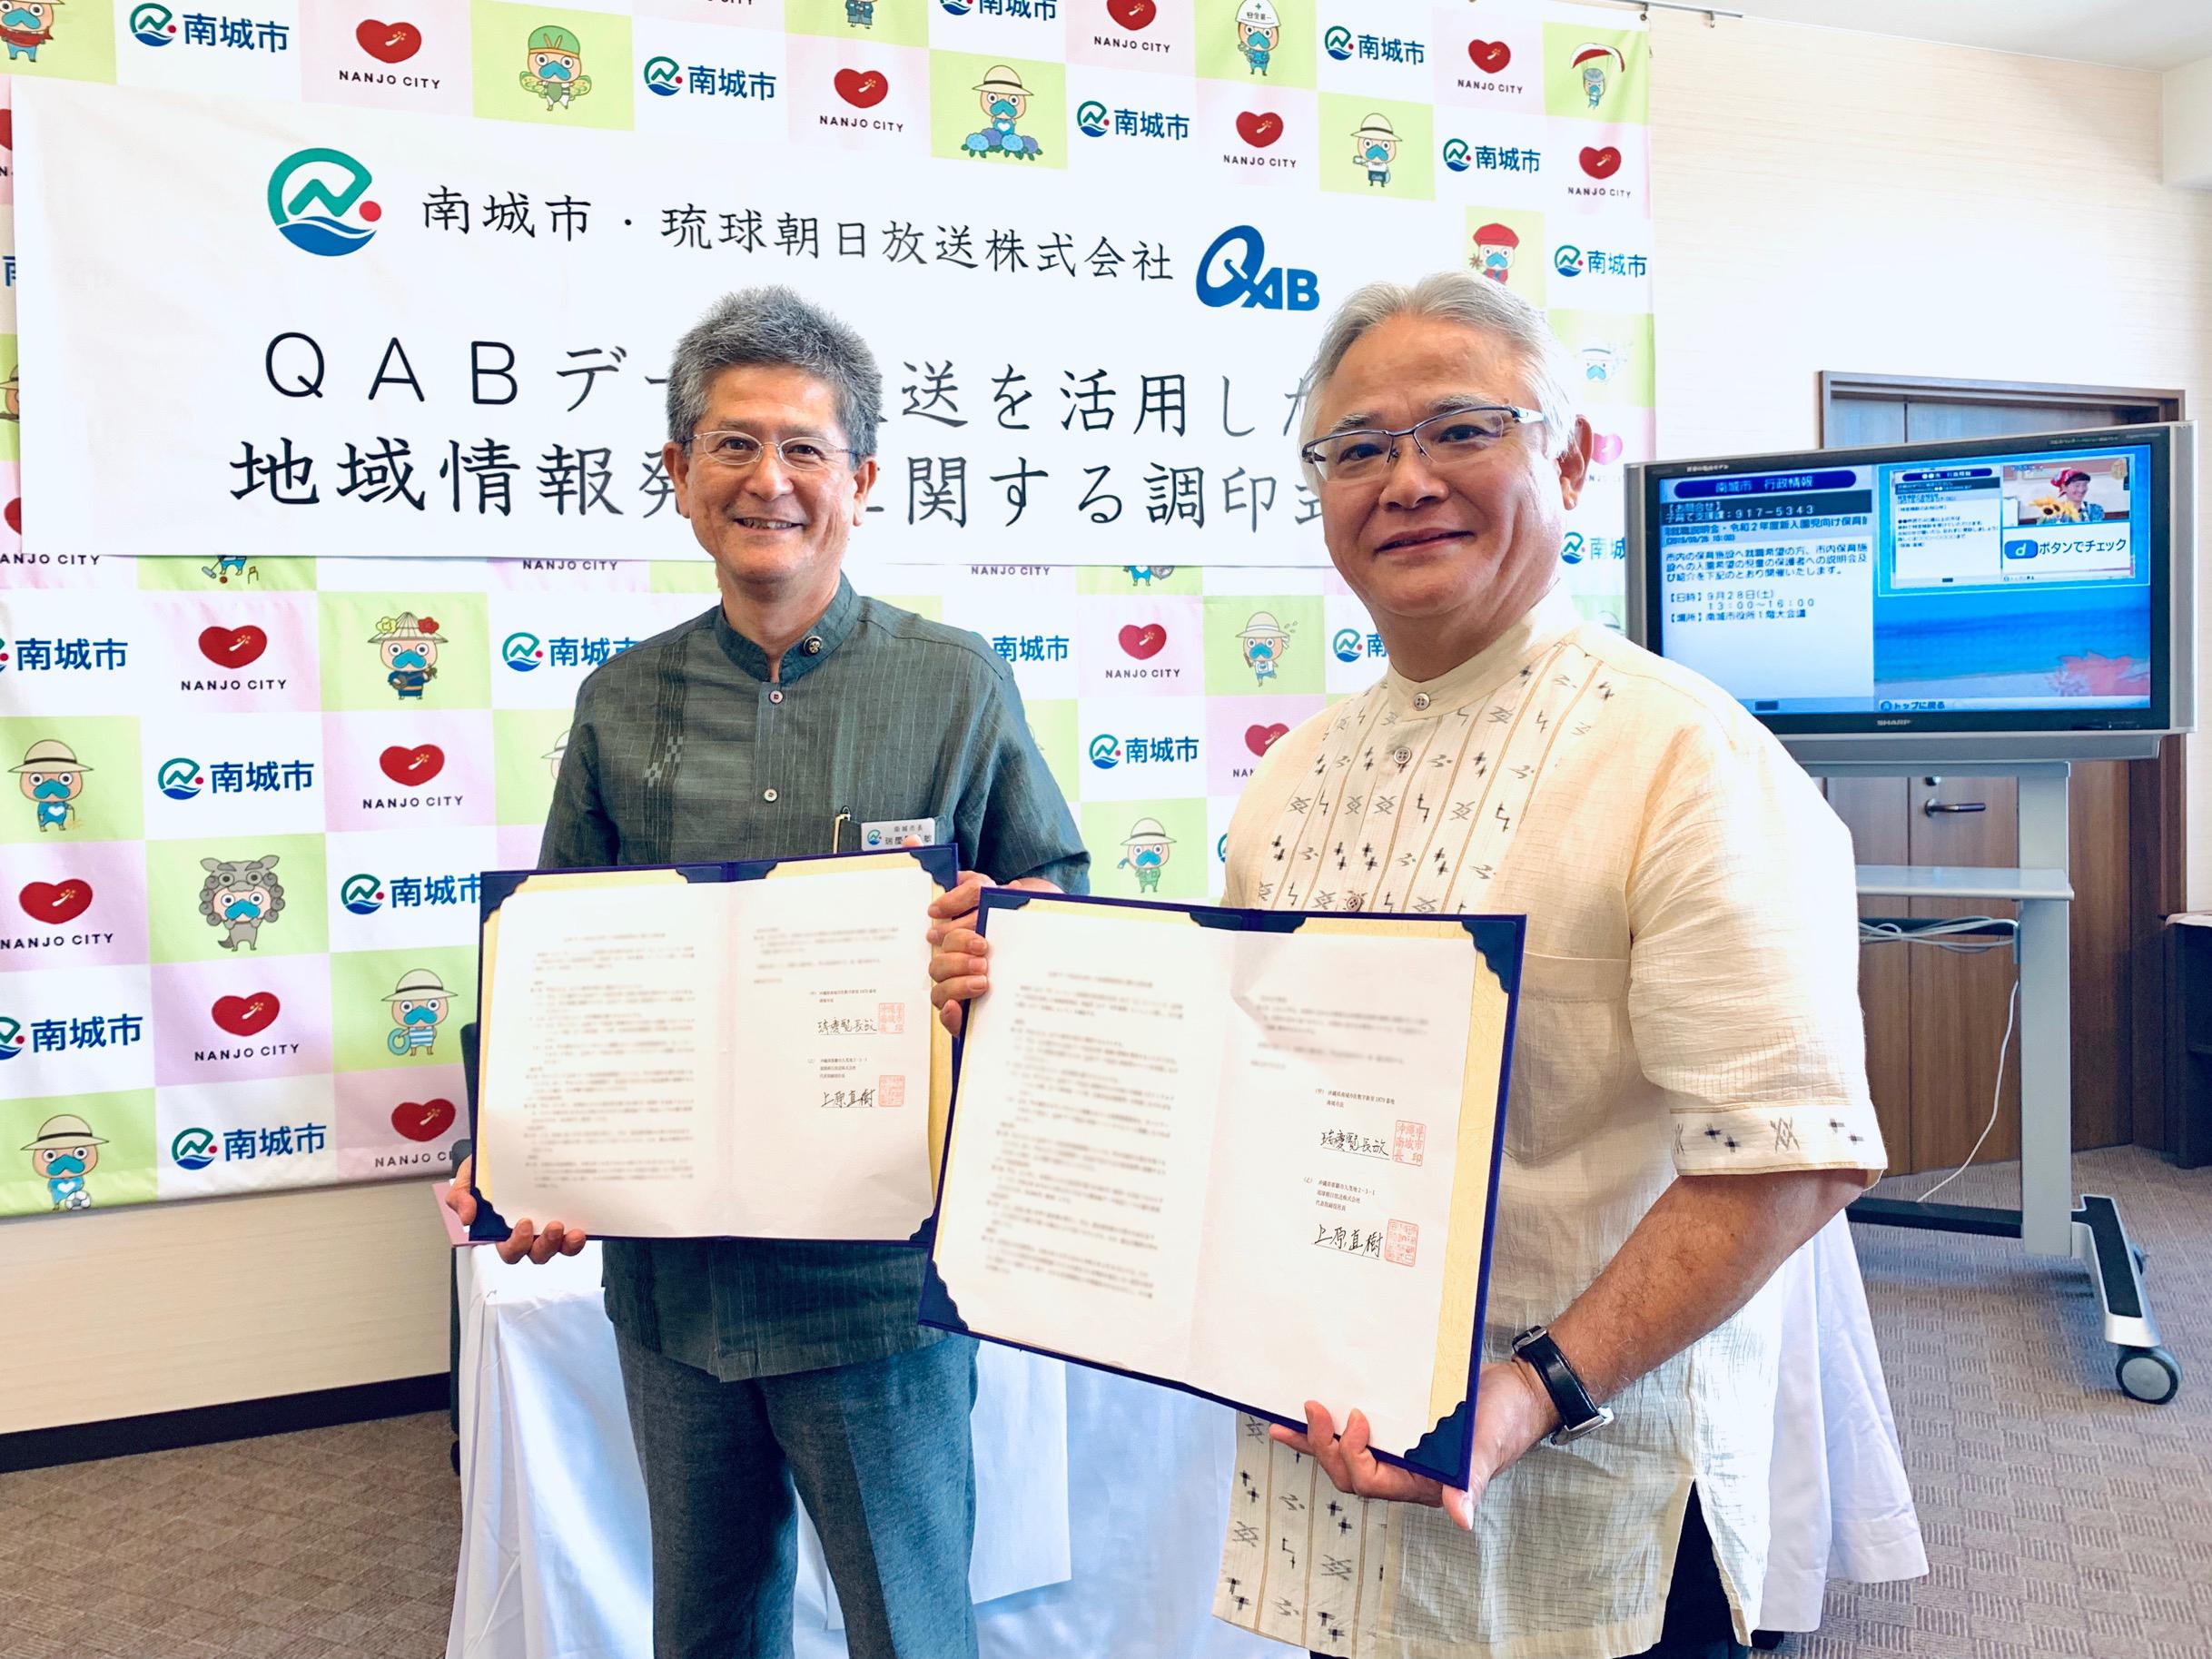 QAB琉球朝日放送、沖縄県南城市とデータ放送で提携